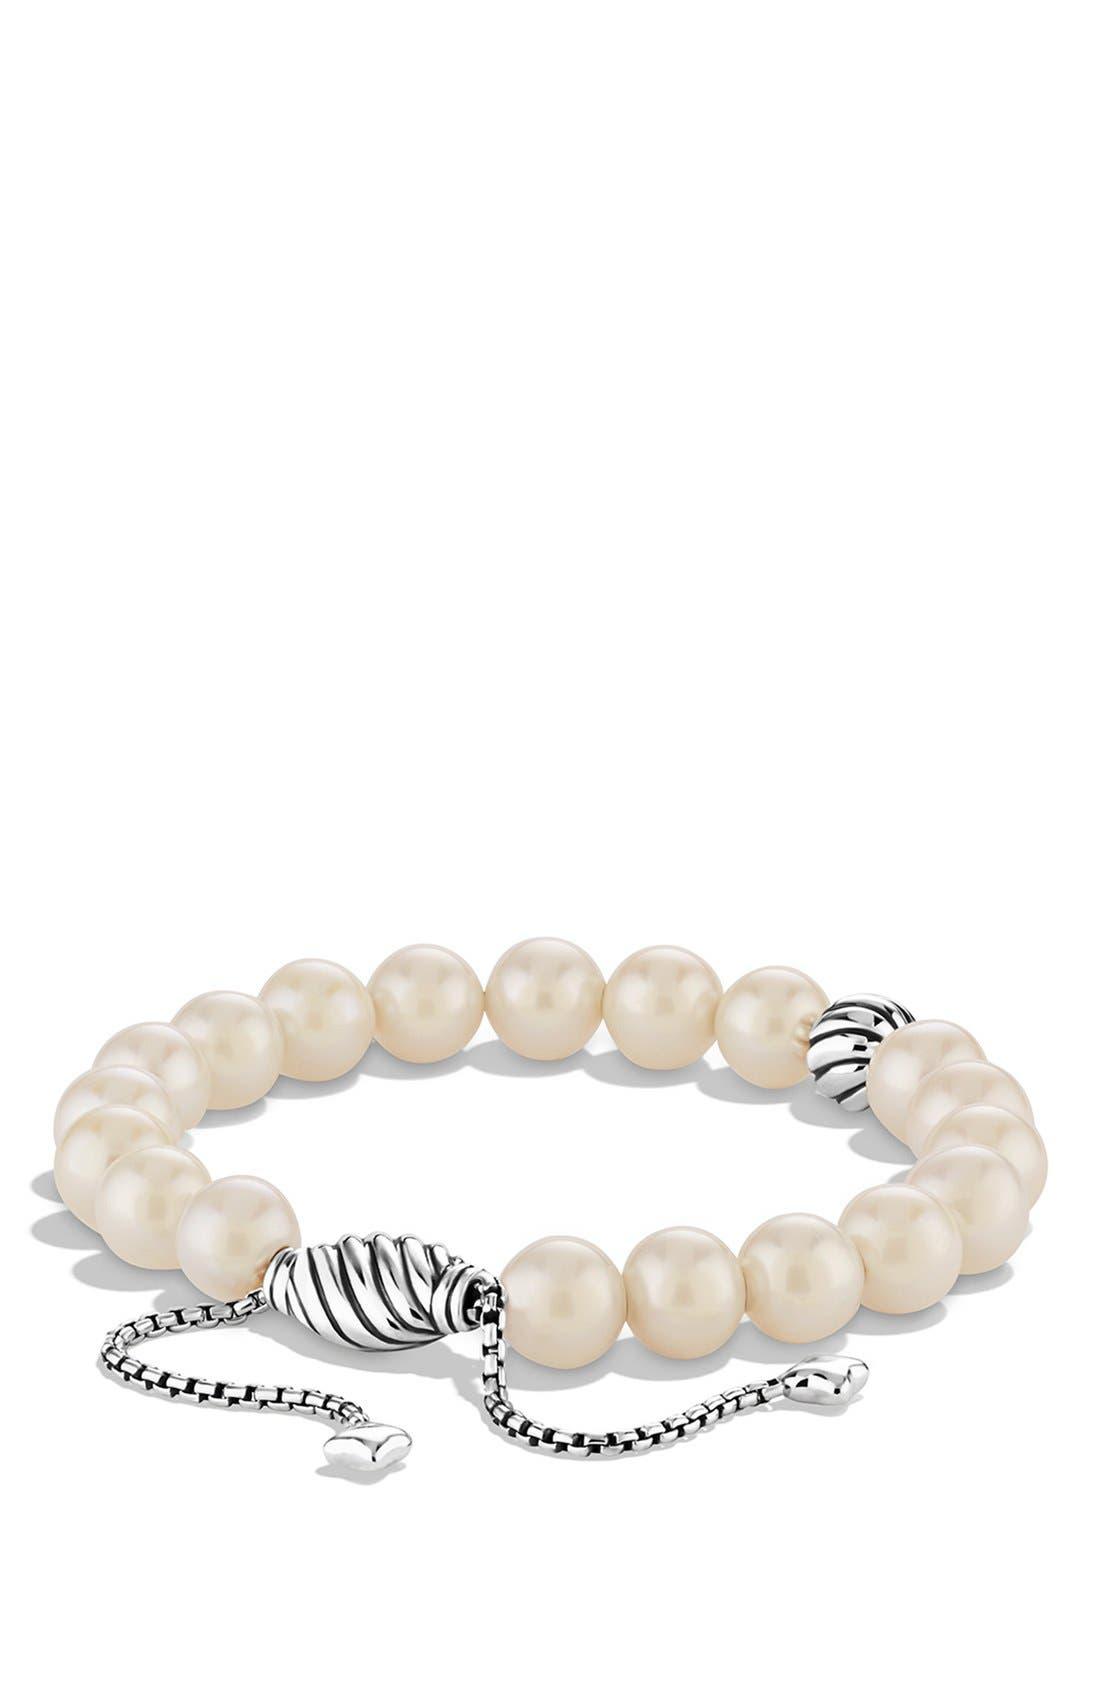 DAVID YURMAN,                             'Spiritual Beads' Bracelet with Pearls,                             Main thumbnail 1, color,                             101